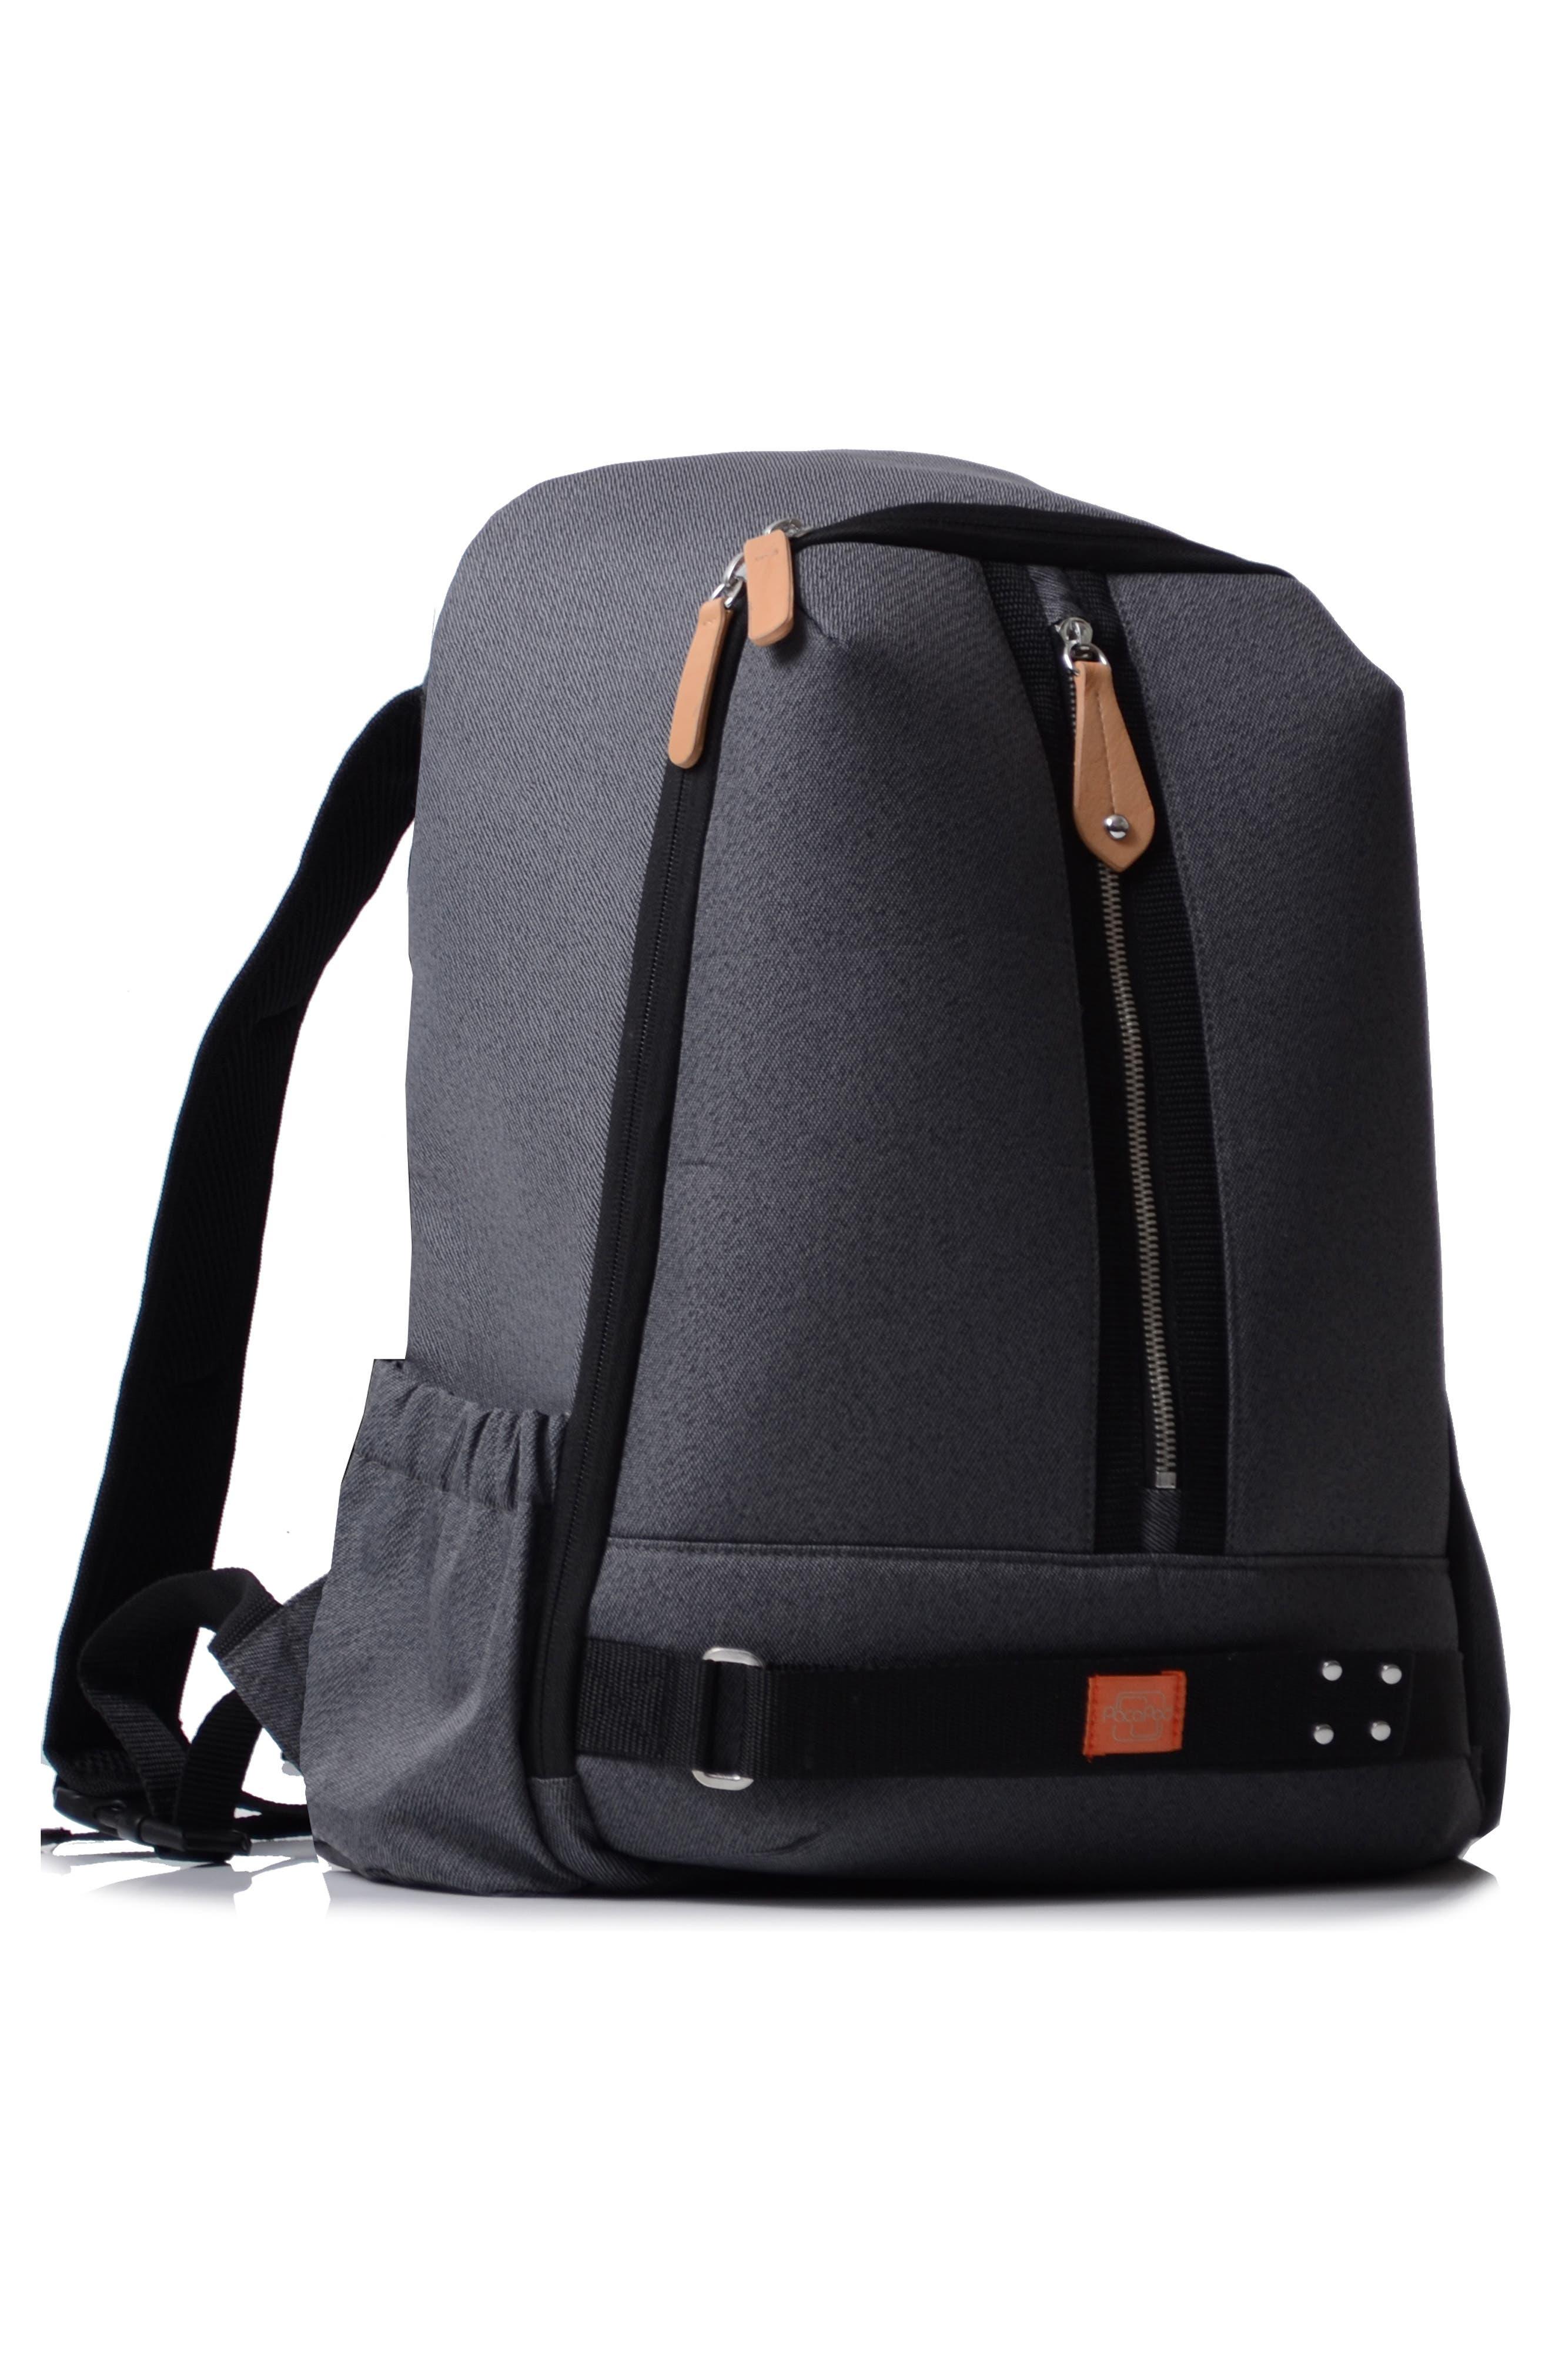 Picos Pack Diaper Backpack,                             Alternate thumbnail 10, color,                             Black Charcoal